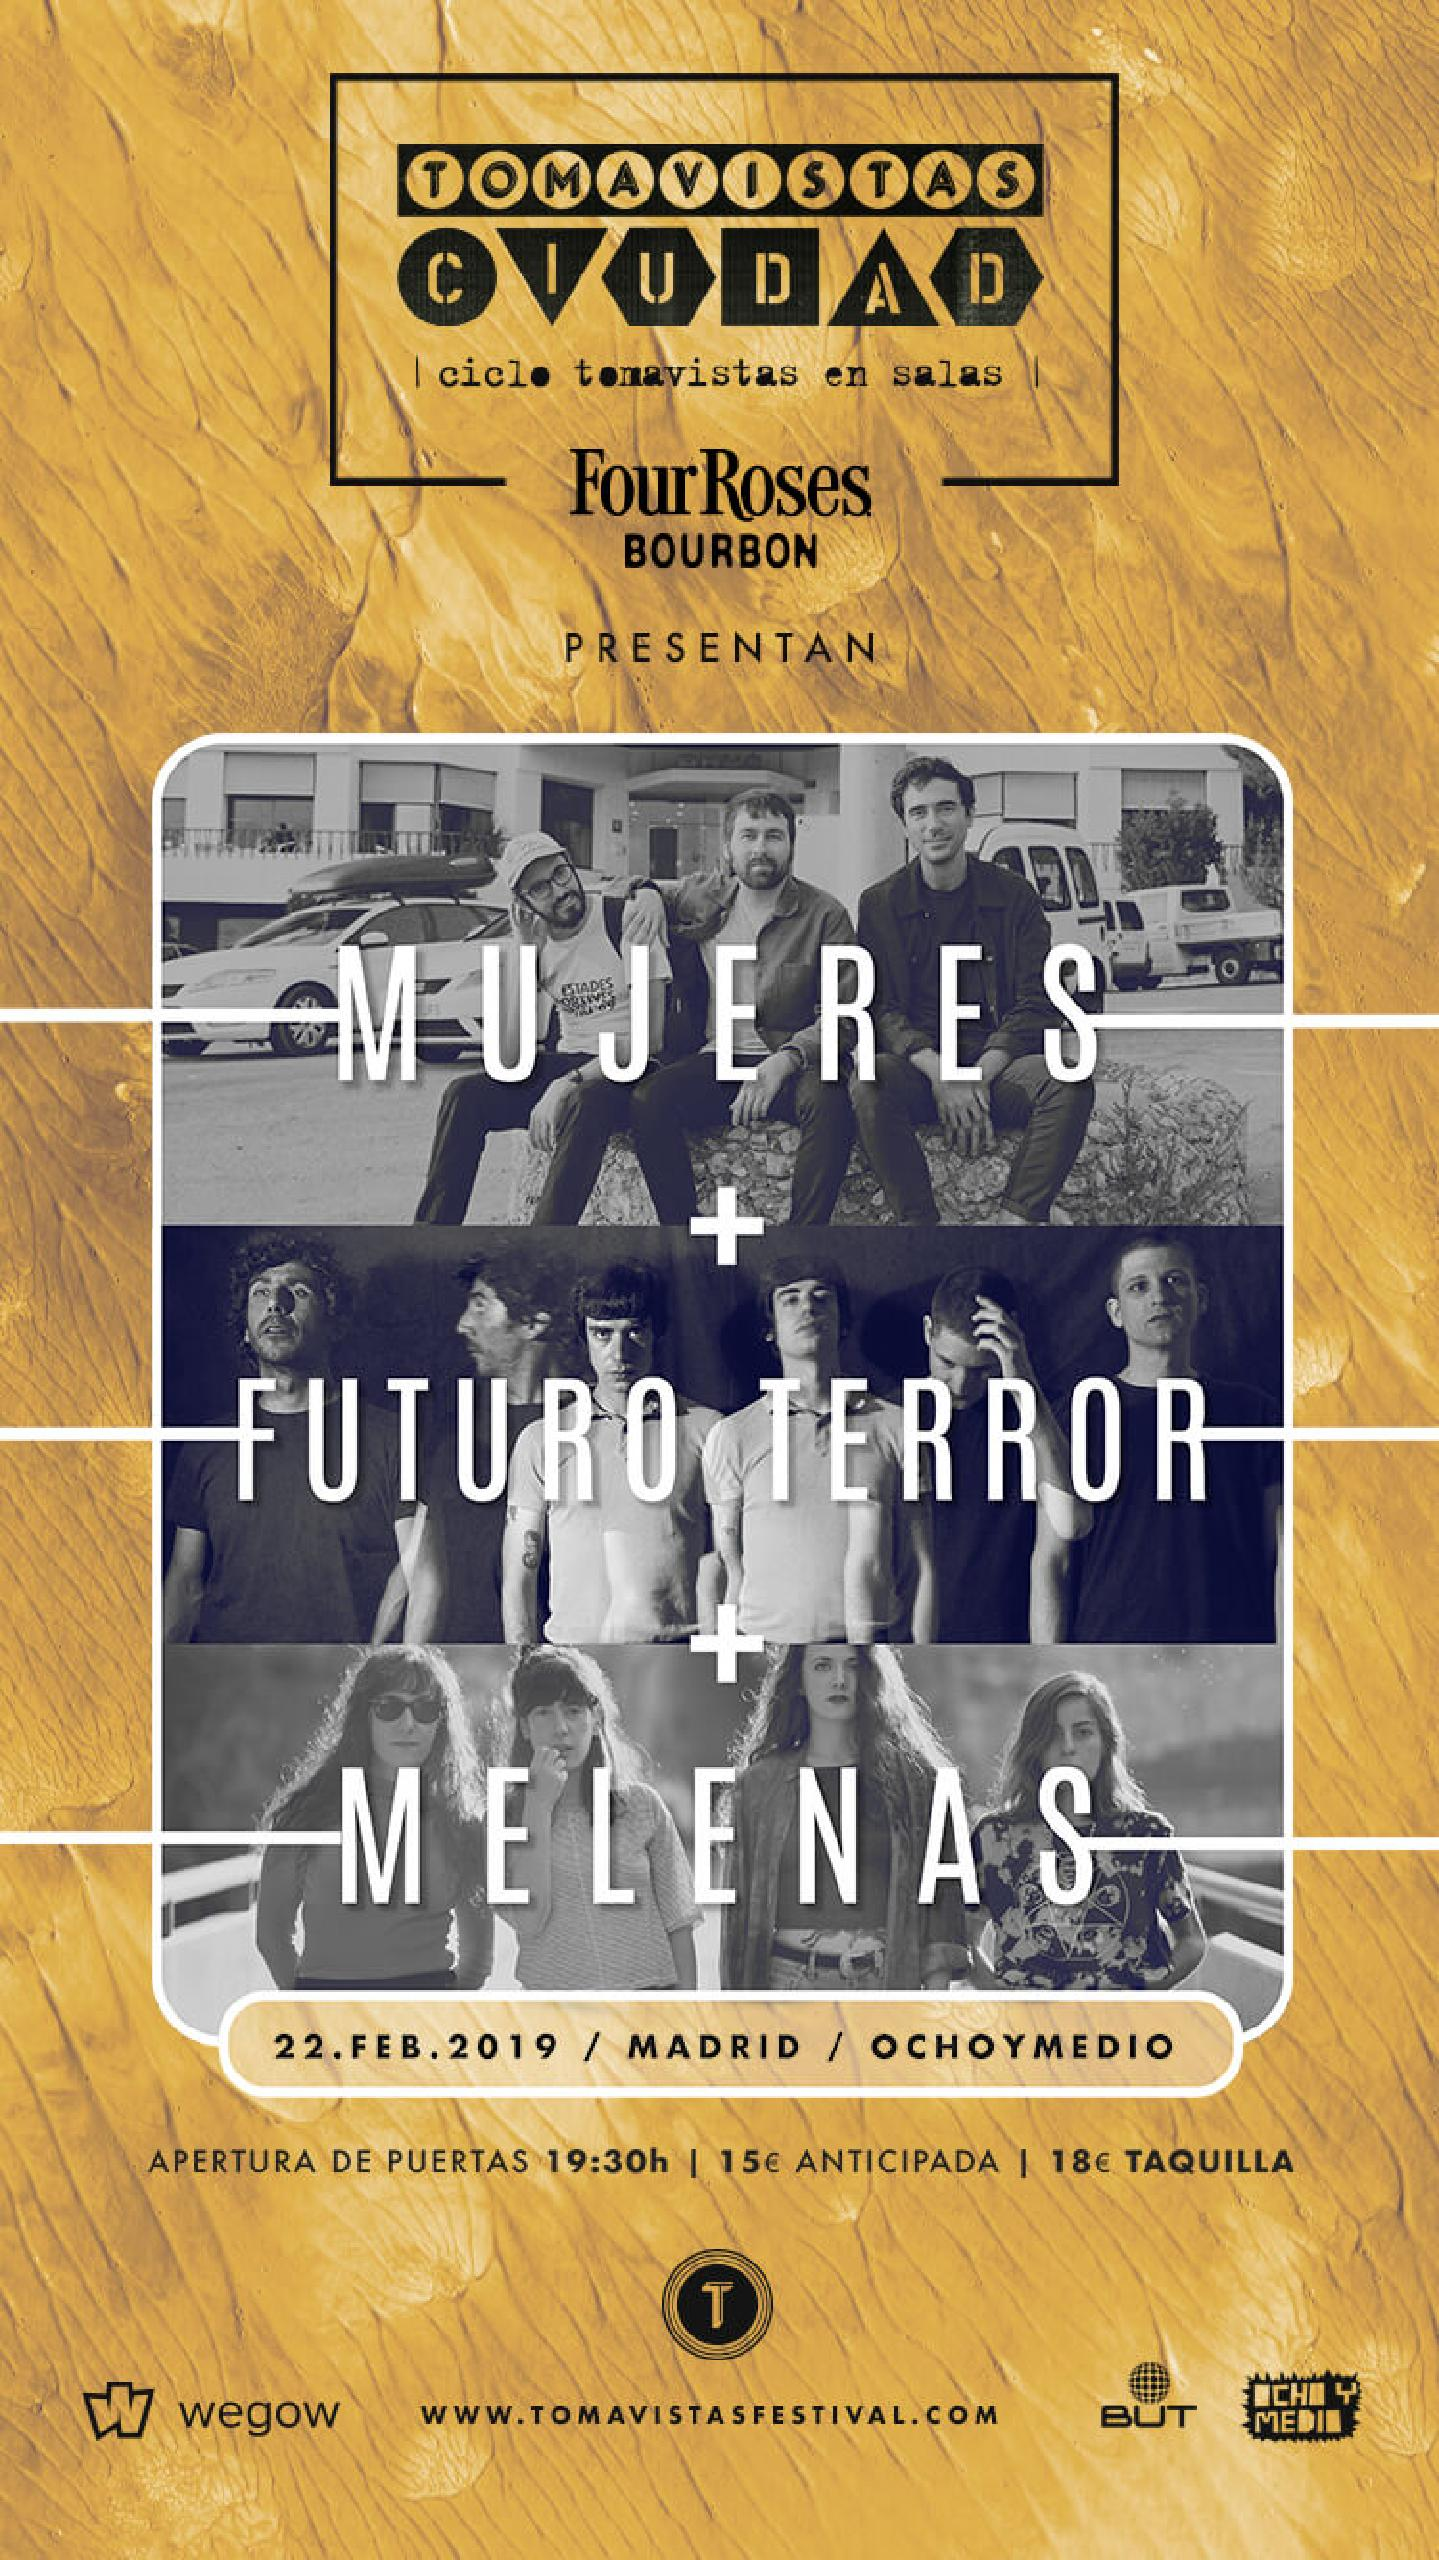 Mujeres + Futuro Terror + Melenas (Tomavistas Ciudad)